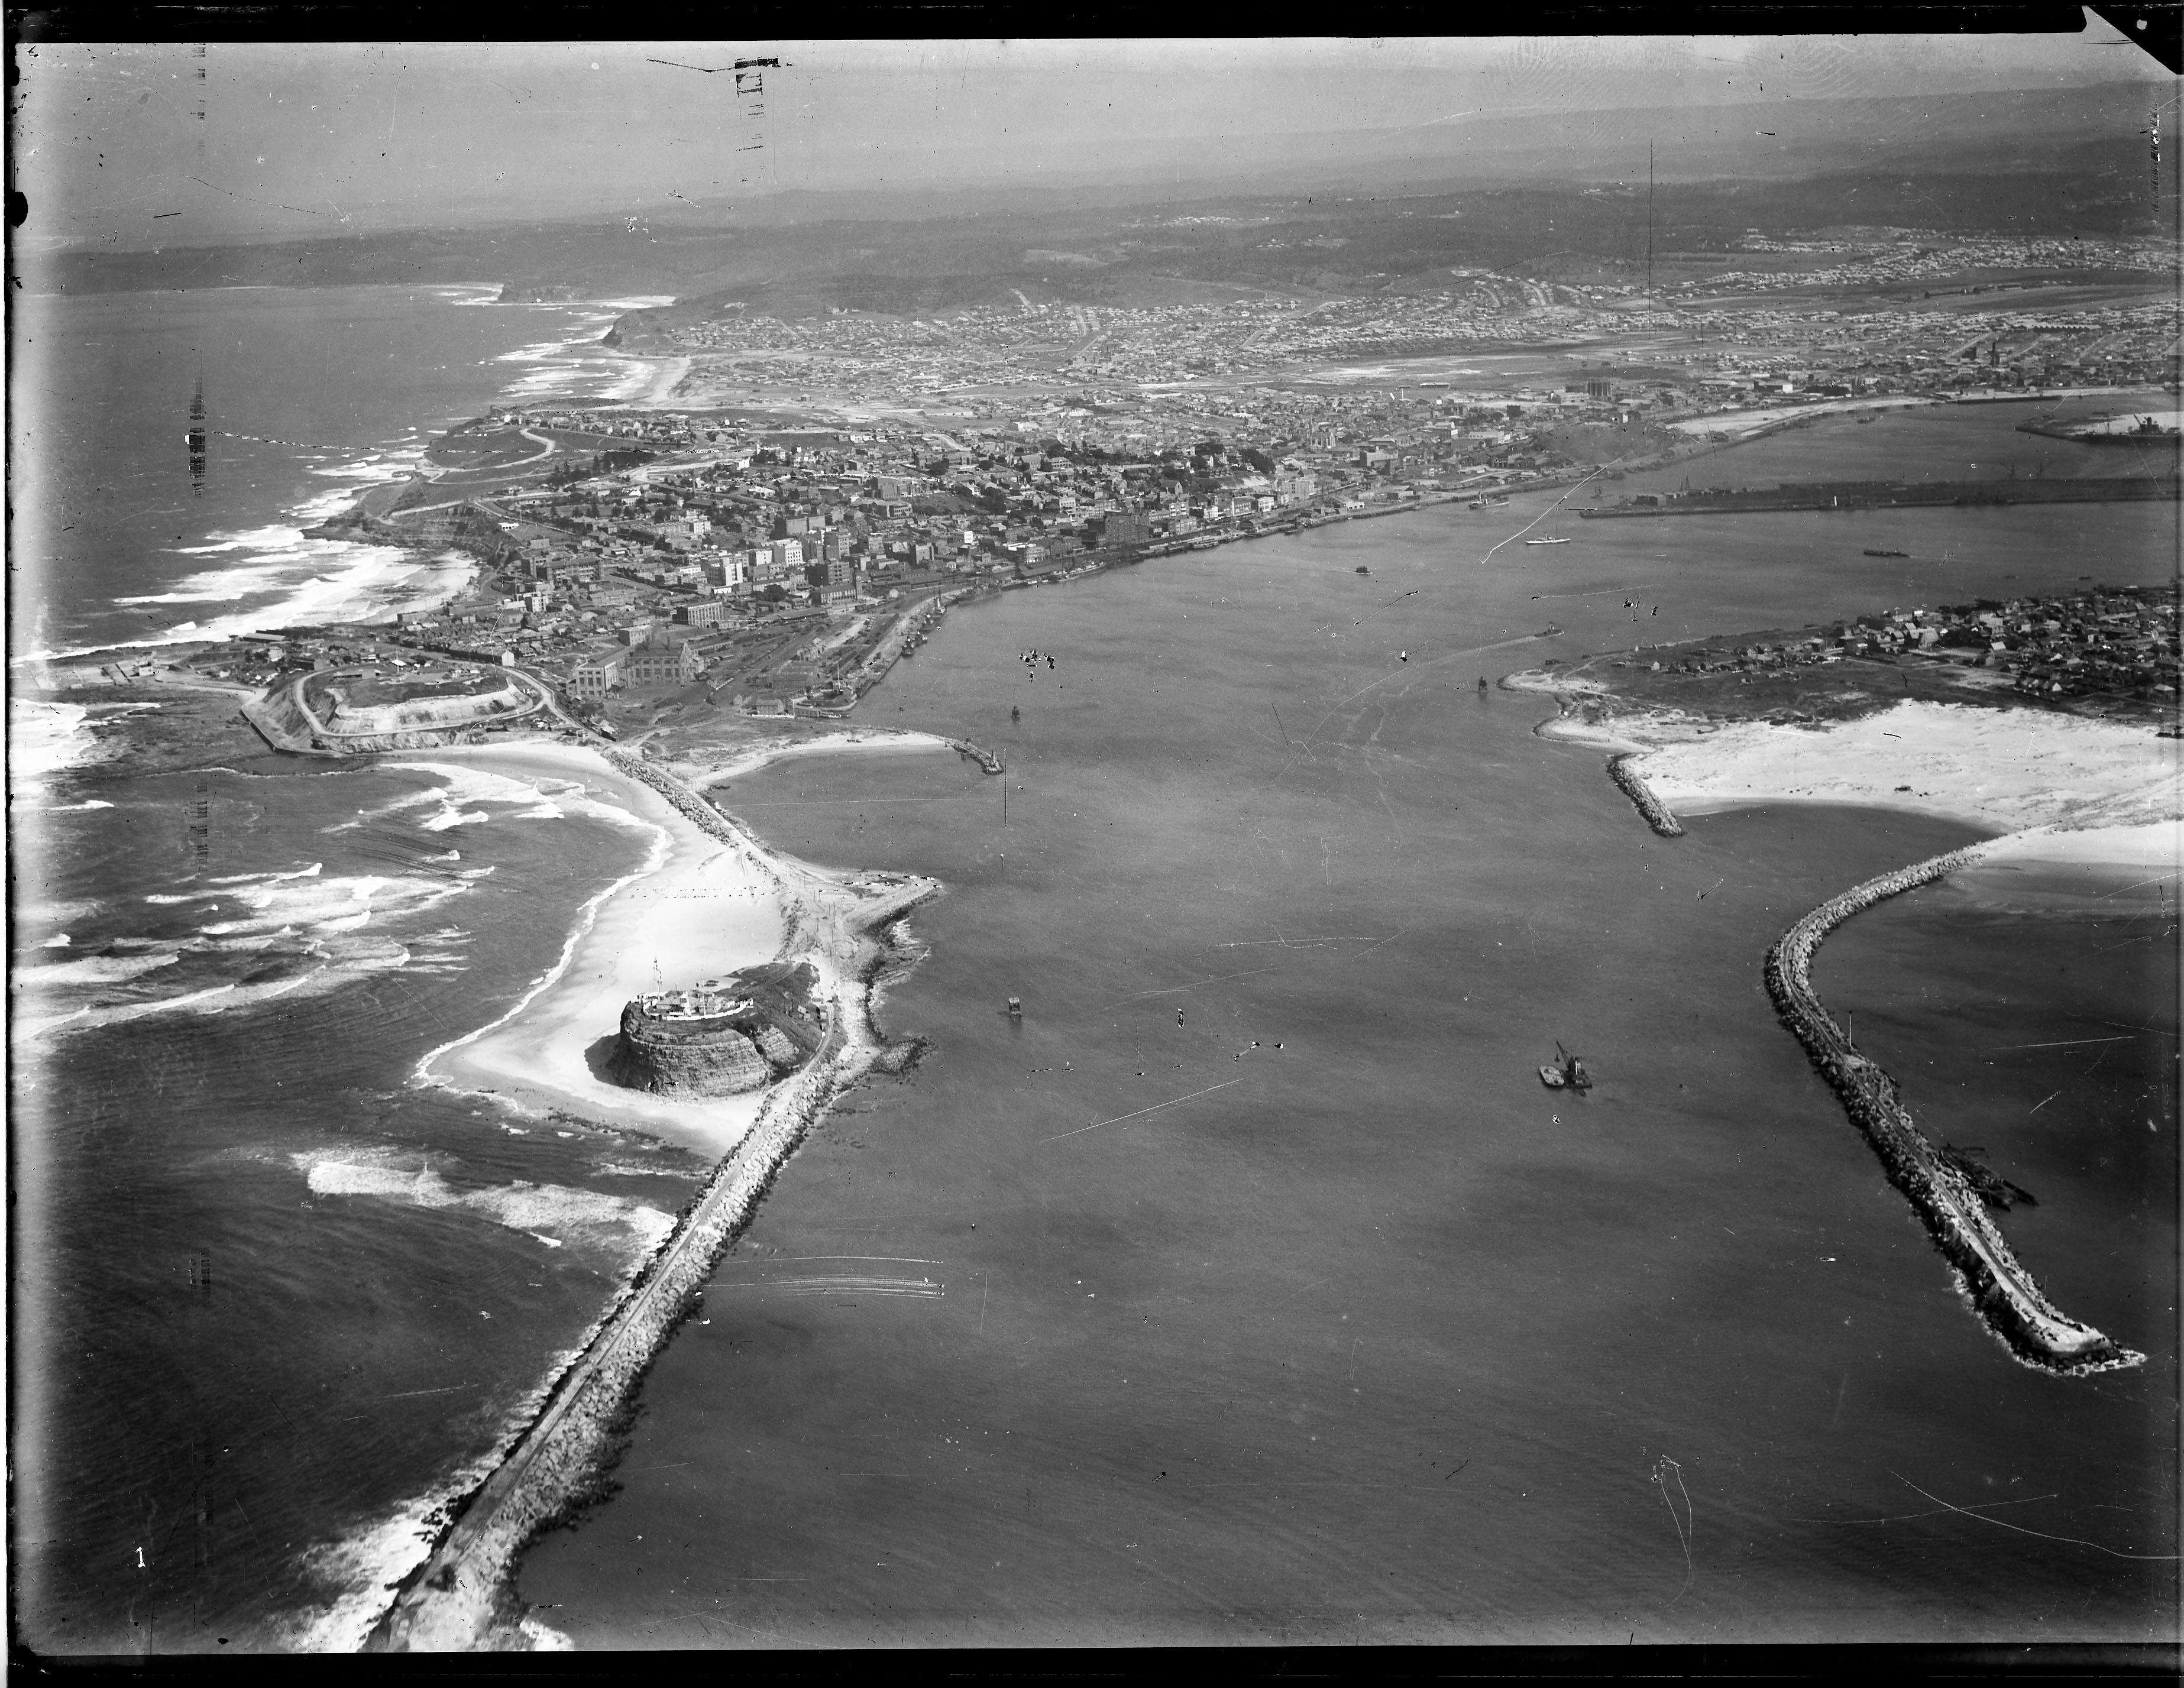 Newcastle aerial, 1934 (Image 61 Courtesy of Phillip Warren)